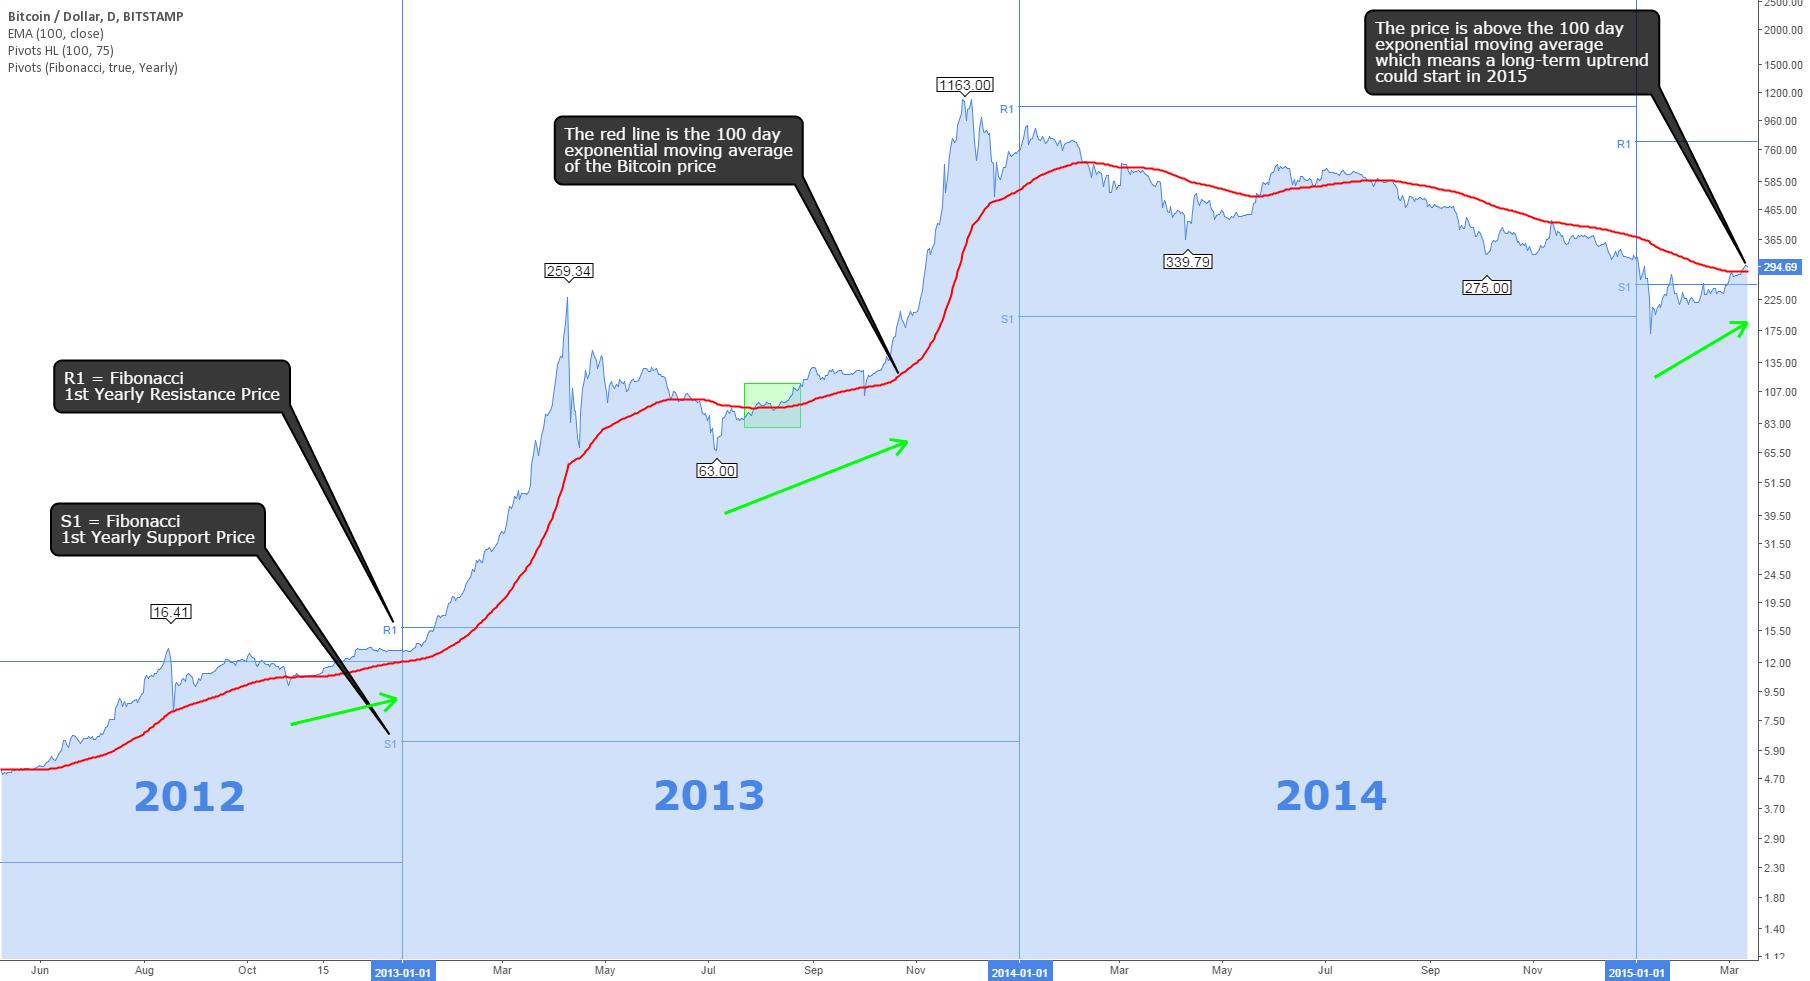 Bitcoin Price 2015 Bullish Potential